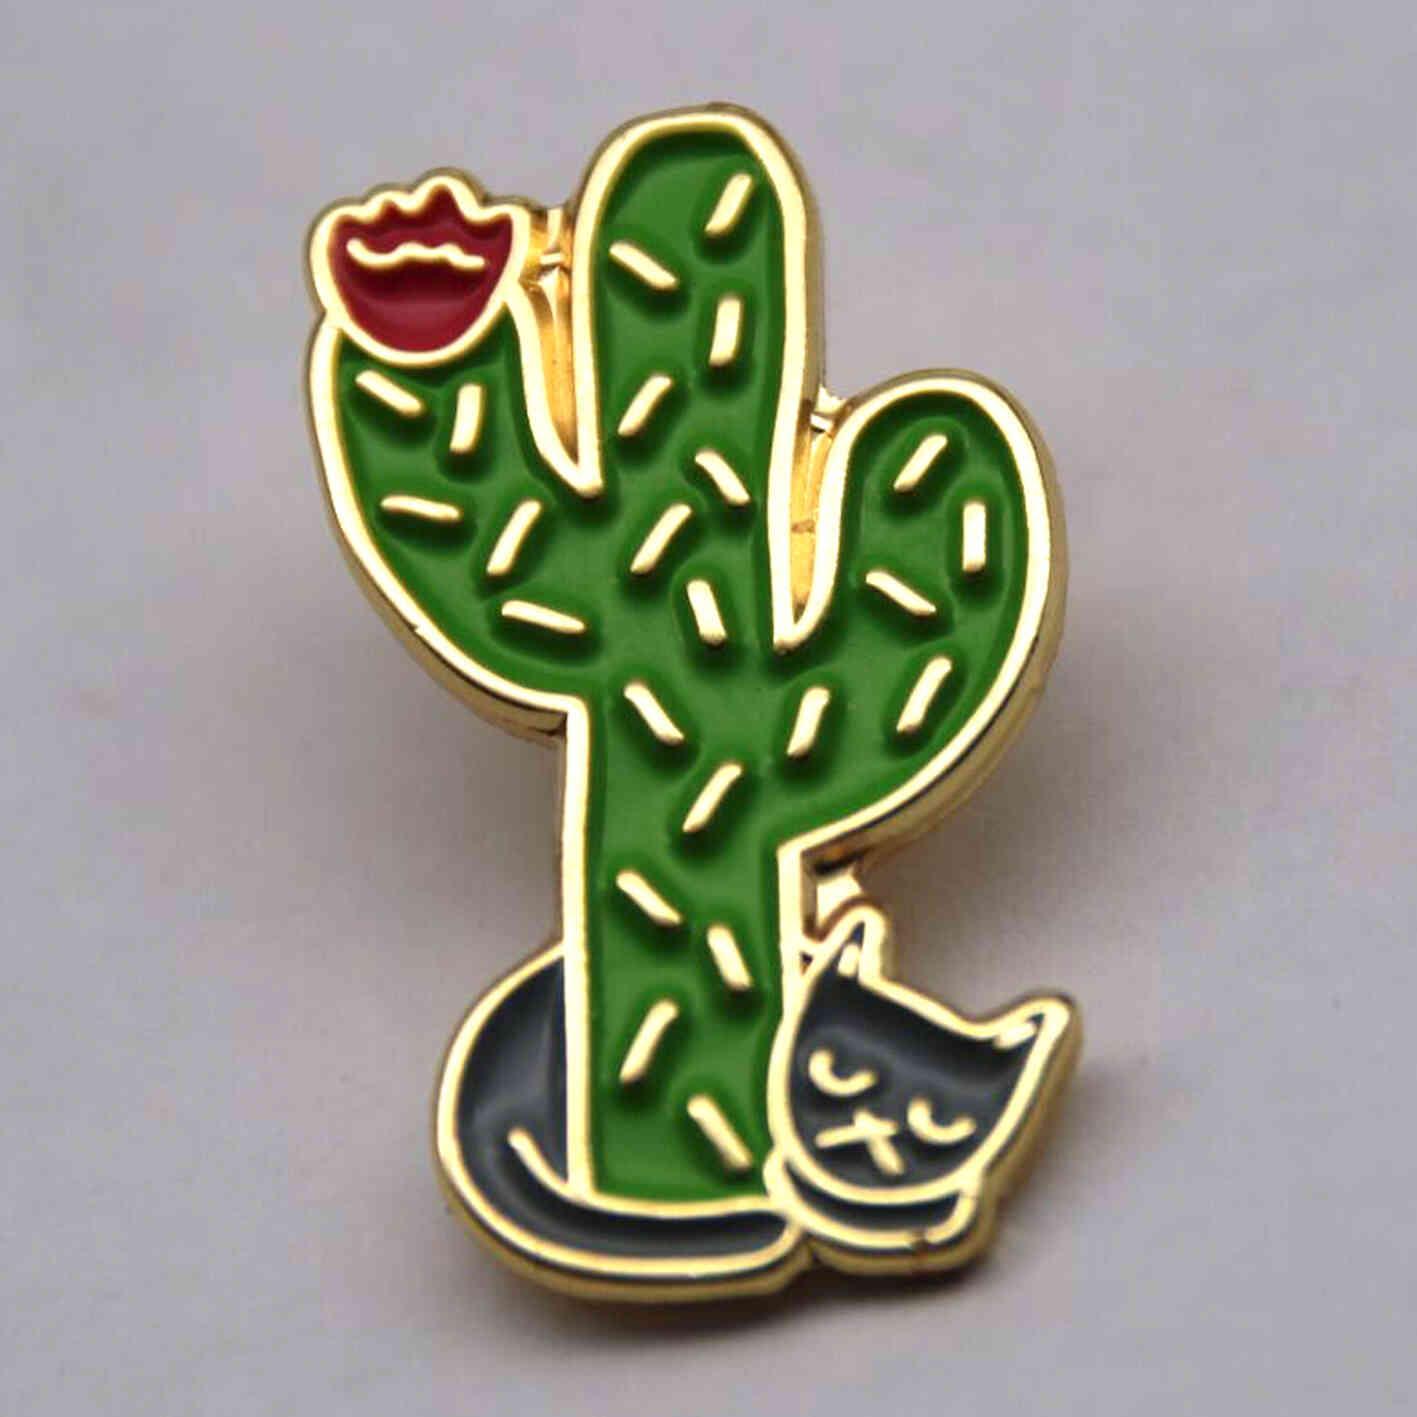 Cacti and Cat Enamel Pins